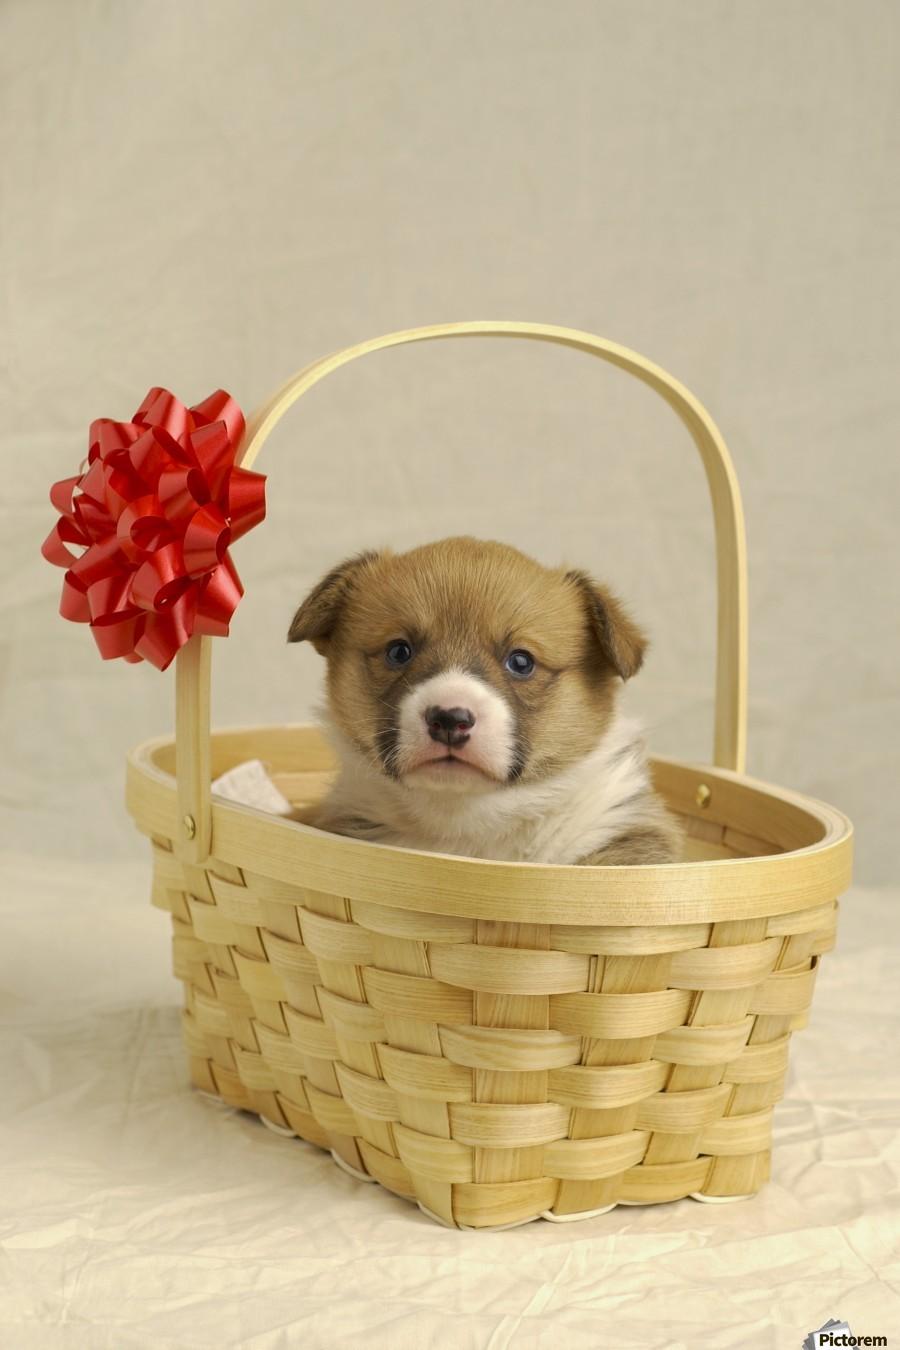 Puppy In A Basket  Print